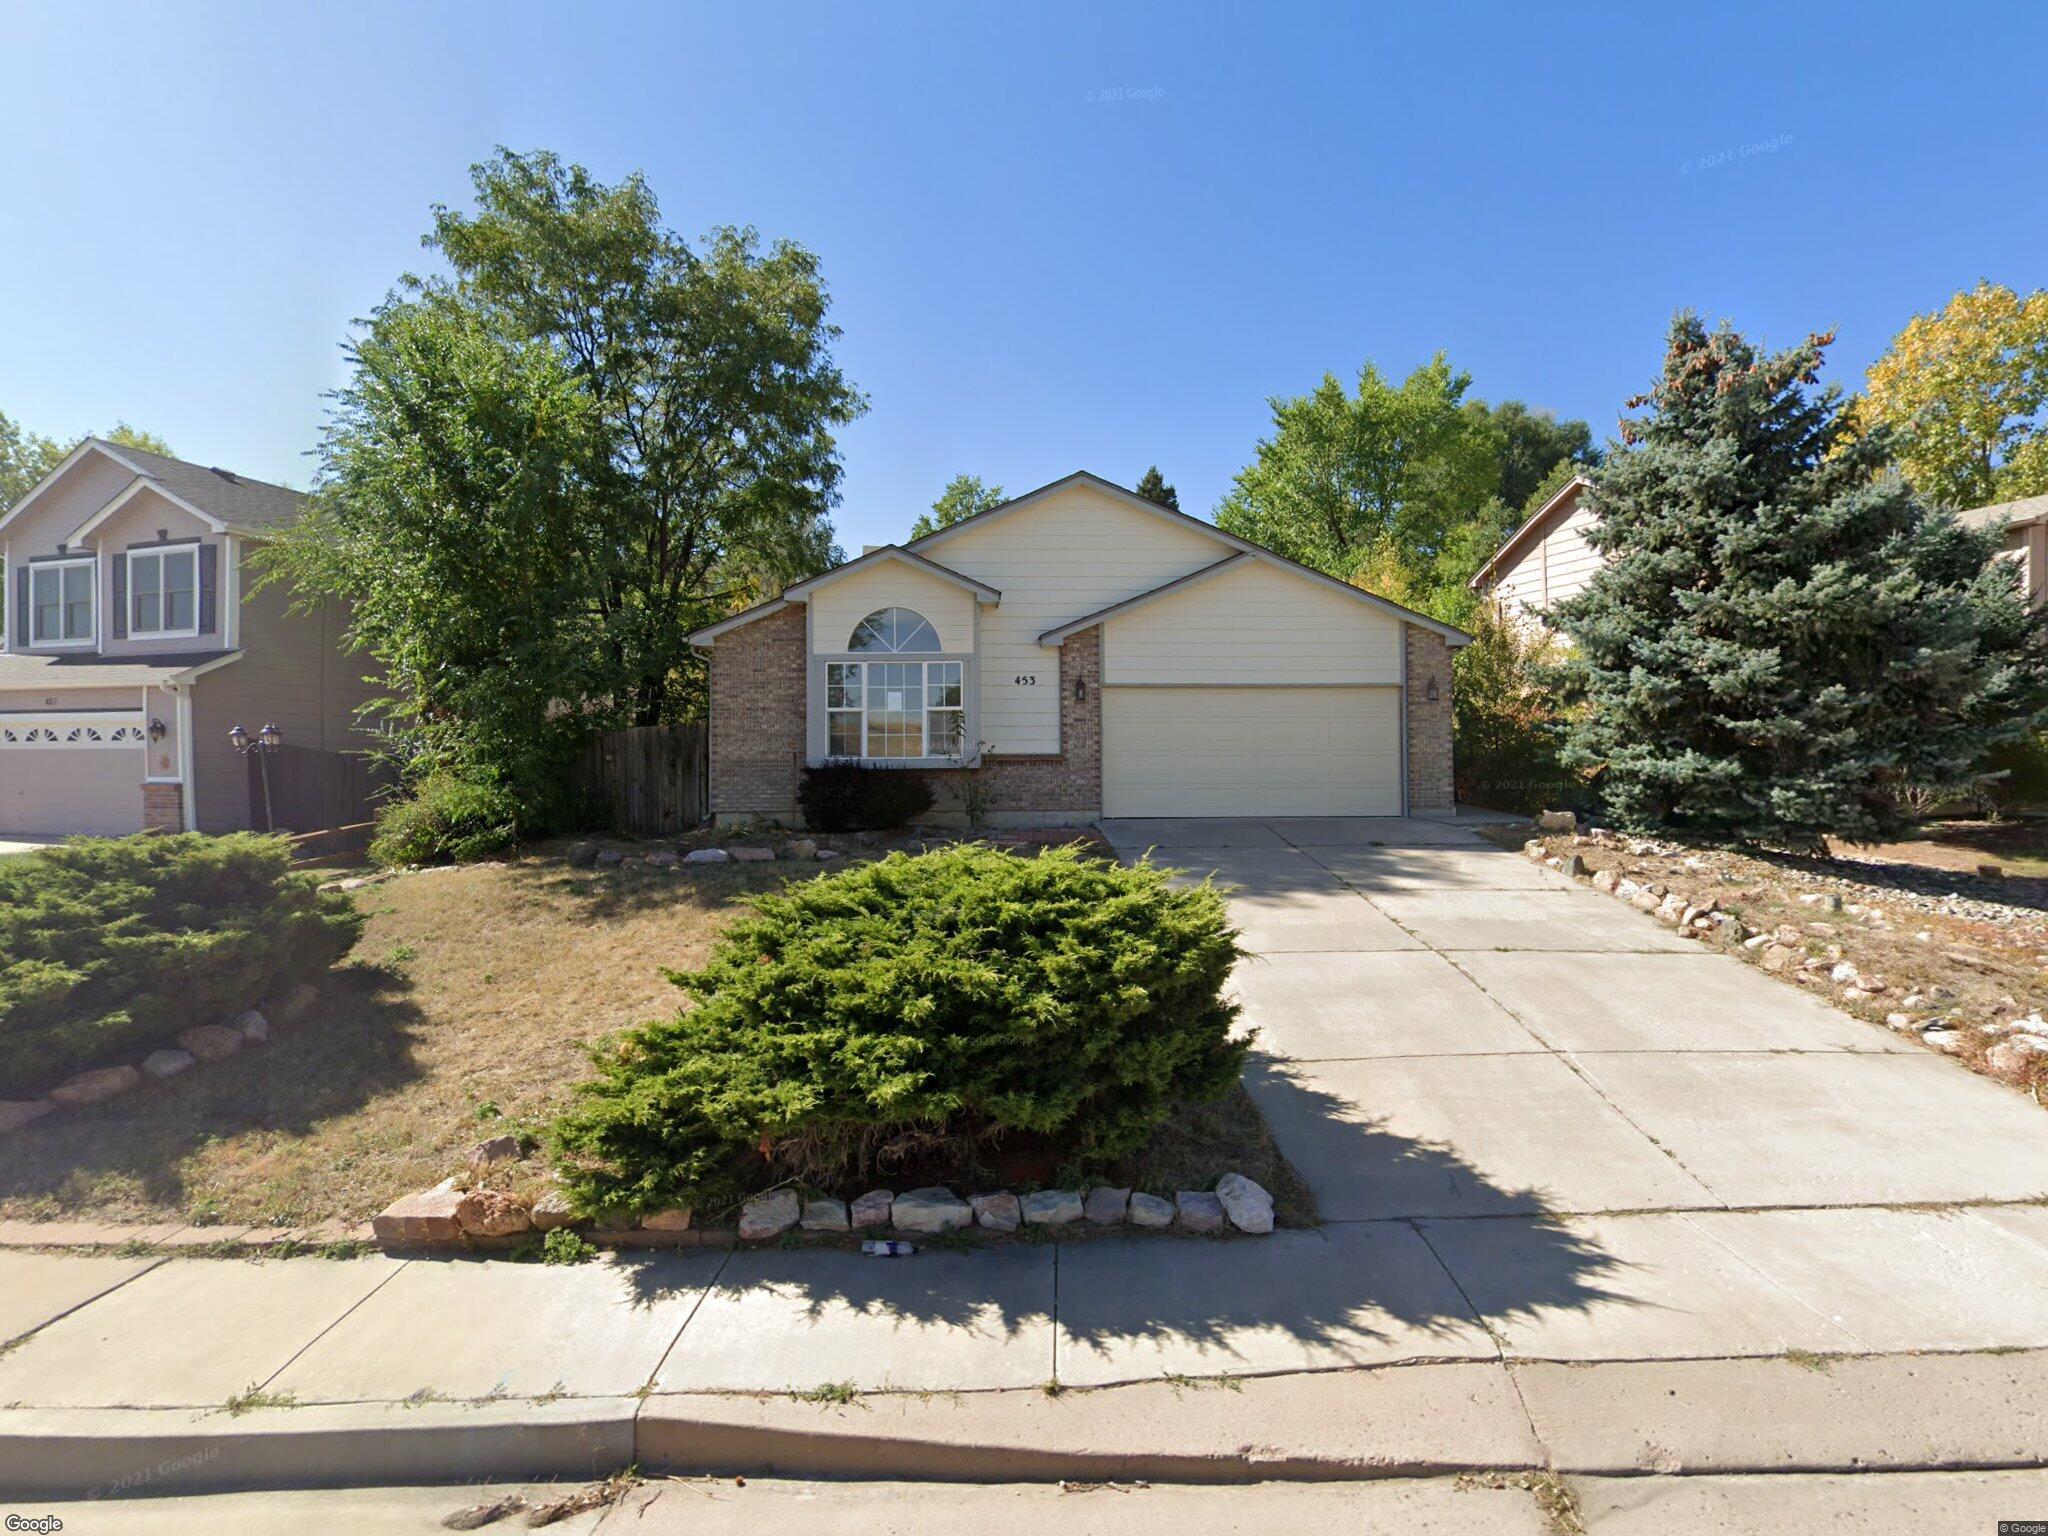 453 Kearney Ave Colorado Springs Co 80906 Foreclosure Trulia